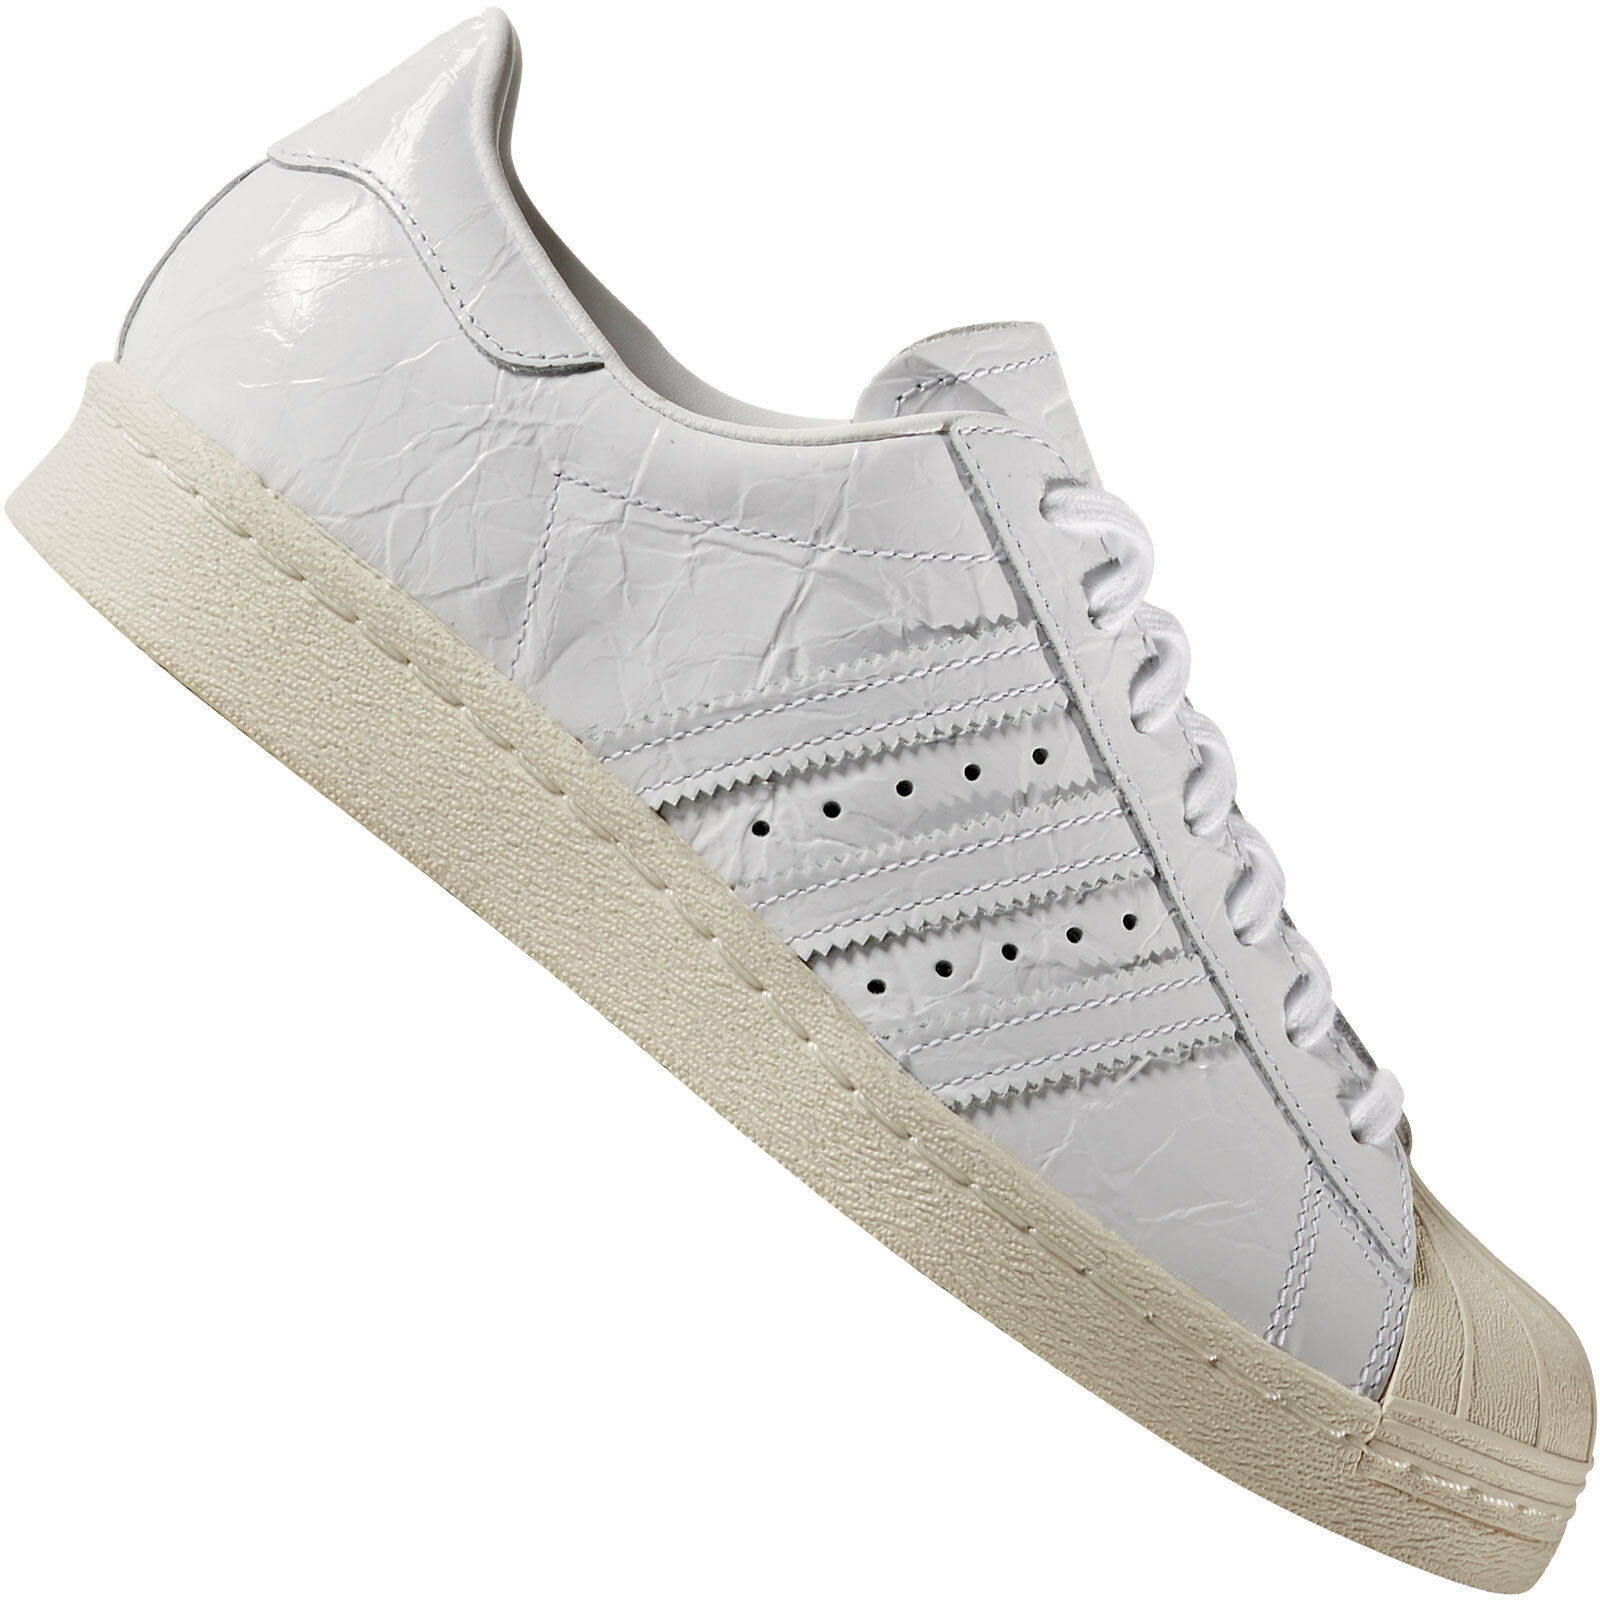 Adidas Originals Superstar Superstar Superstar Zapatillas women whiteo Piel Charol shoes Nuevo db6a3e